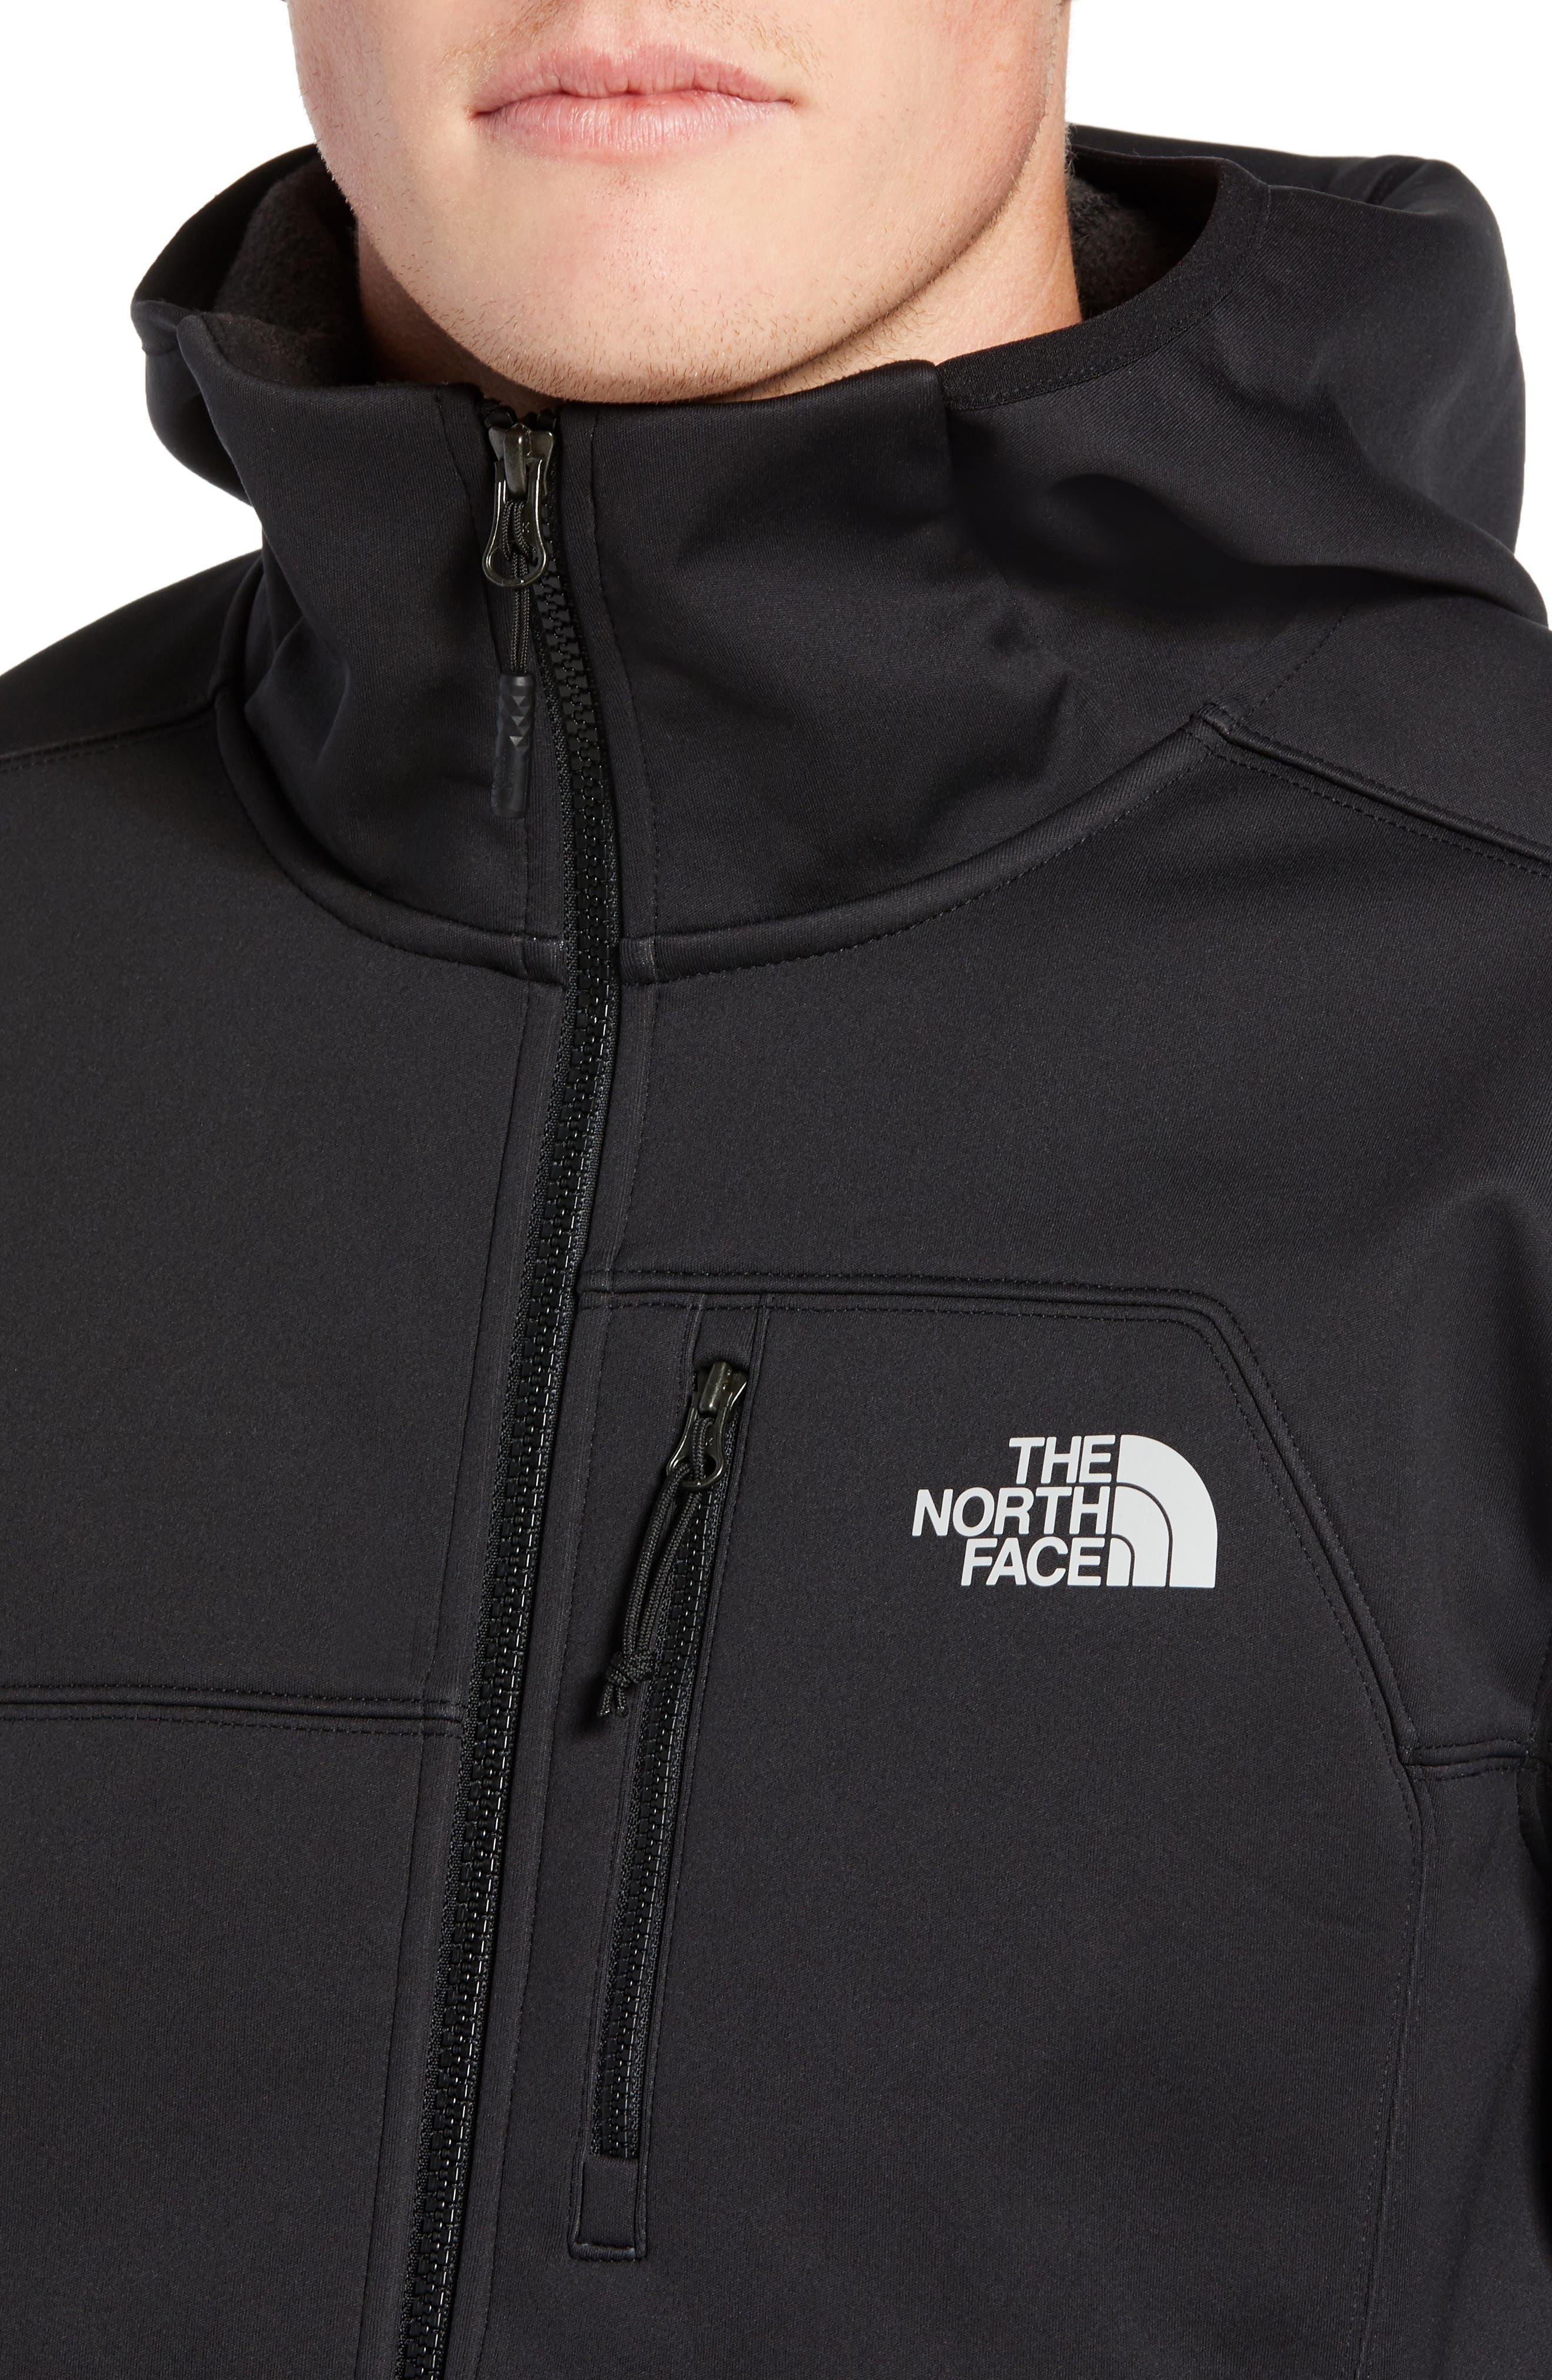 North Face Apex Risor Hooded Jacket,                             Alternate thumbnail 4, color,                             TNF BLACK/ TNF BLACK